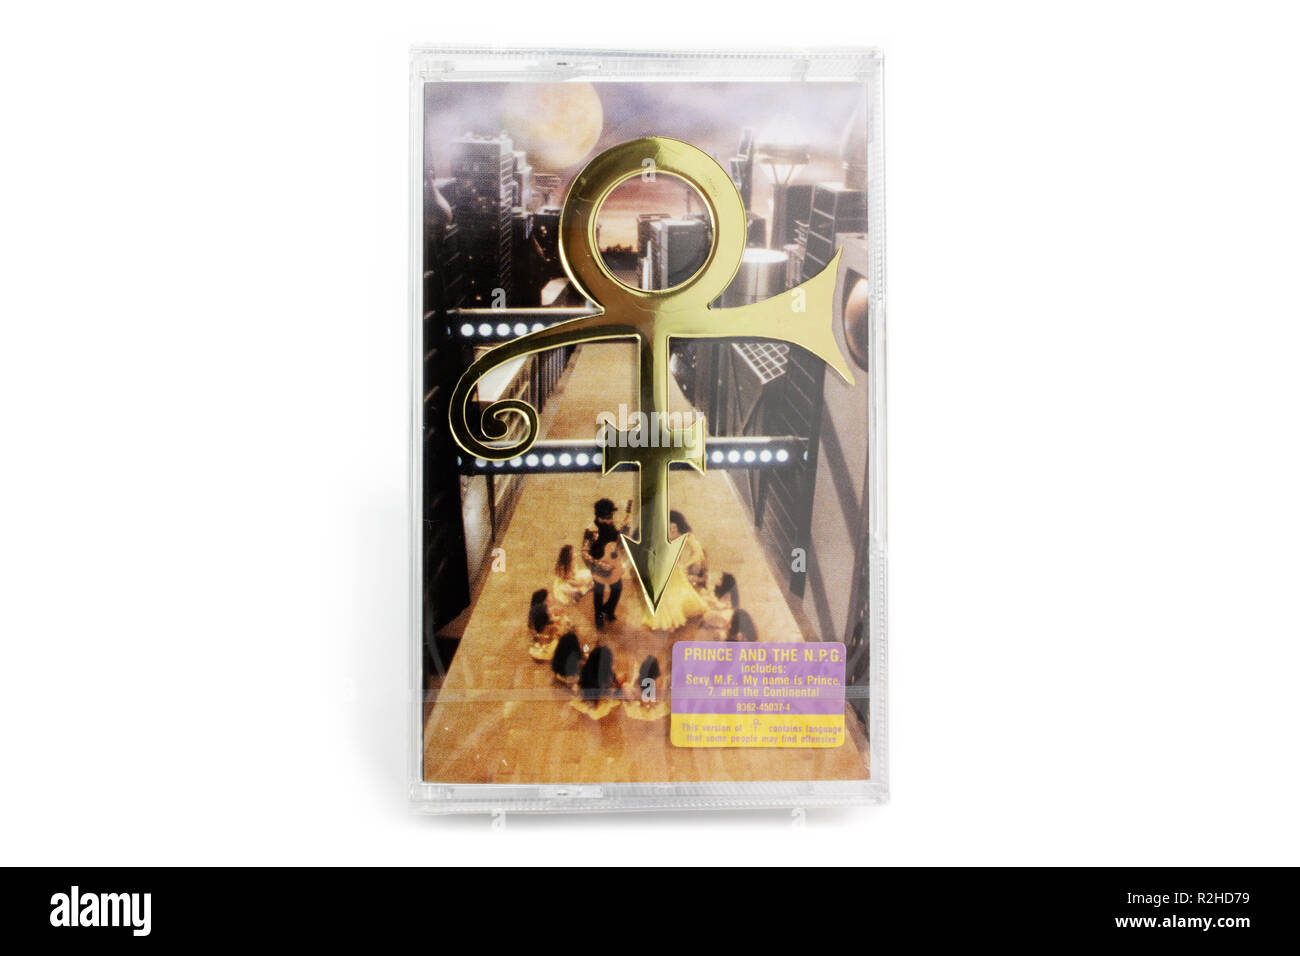 Prague, CZECH REPUBLIC - NOVEMBER 17, 2018: Genuine sealed audio cassette, a tape. Music album Love Symbol by Prince on white background - Stock Image